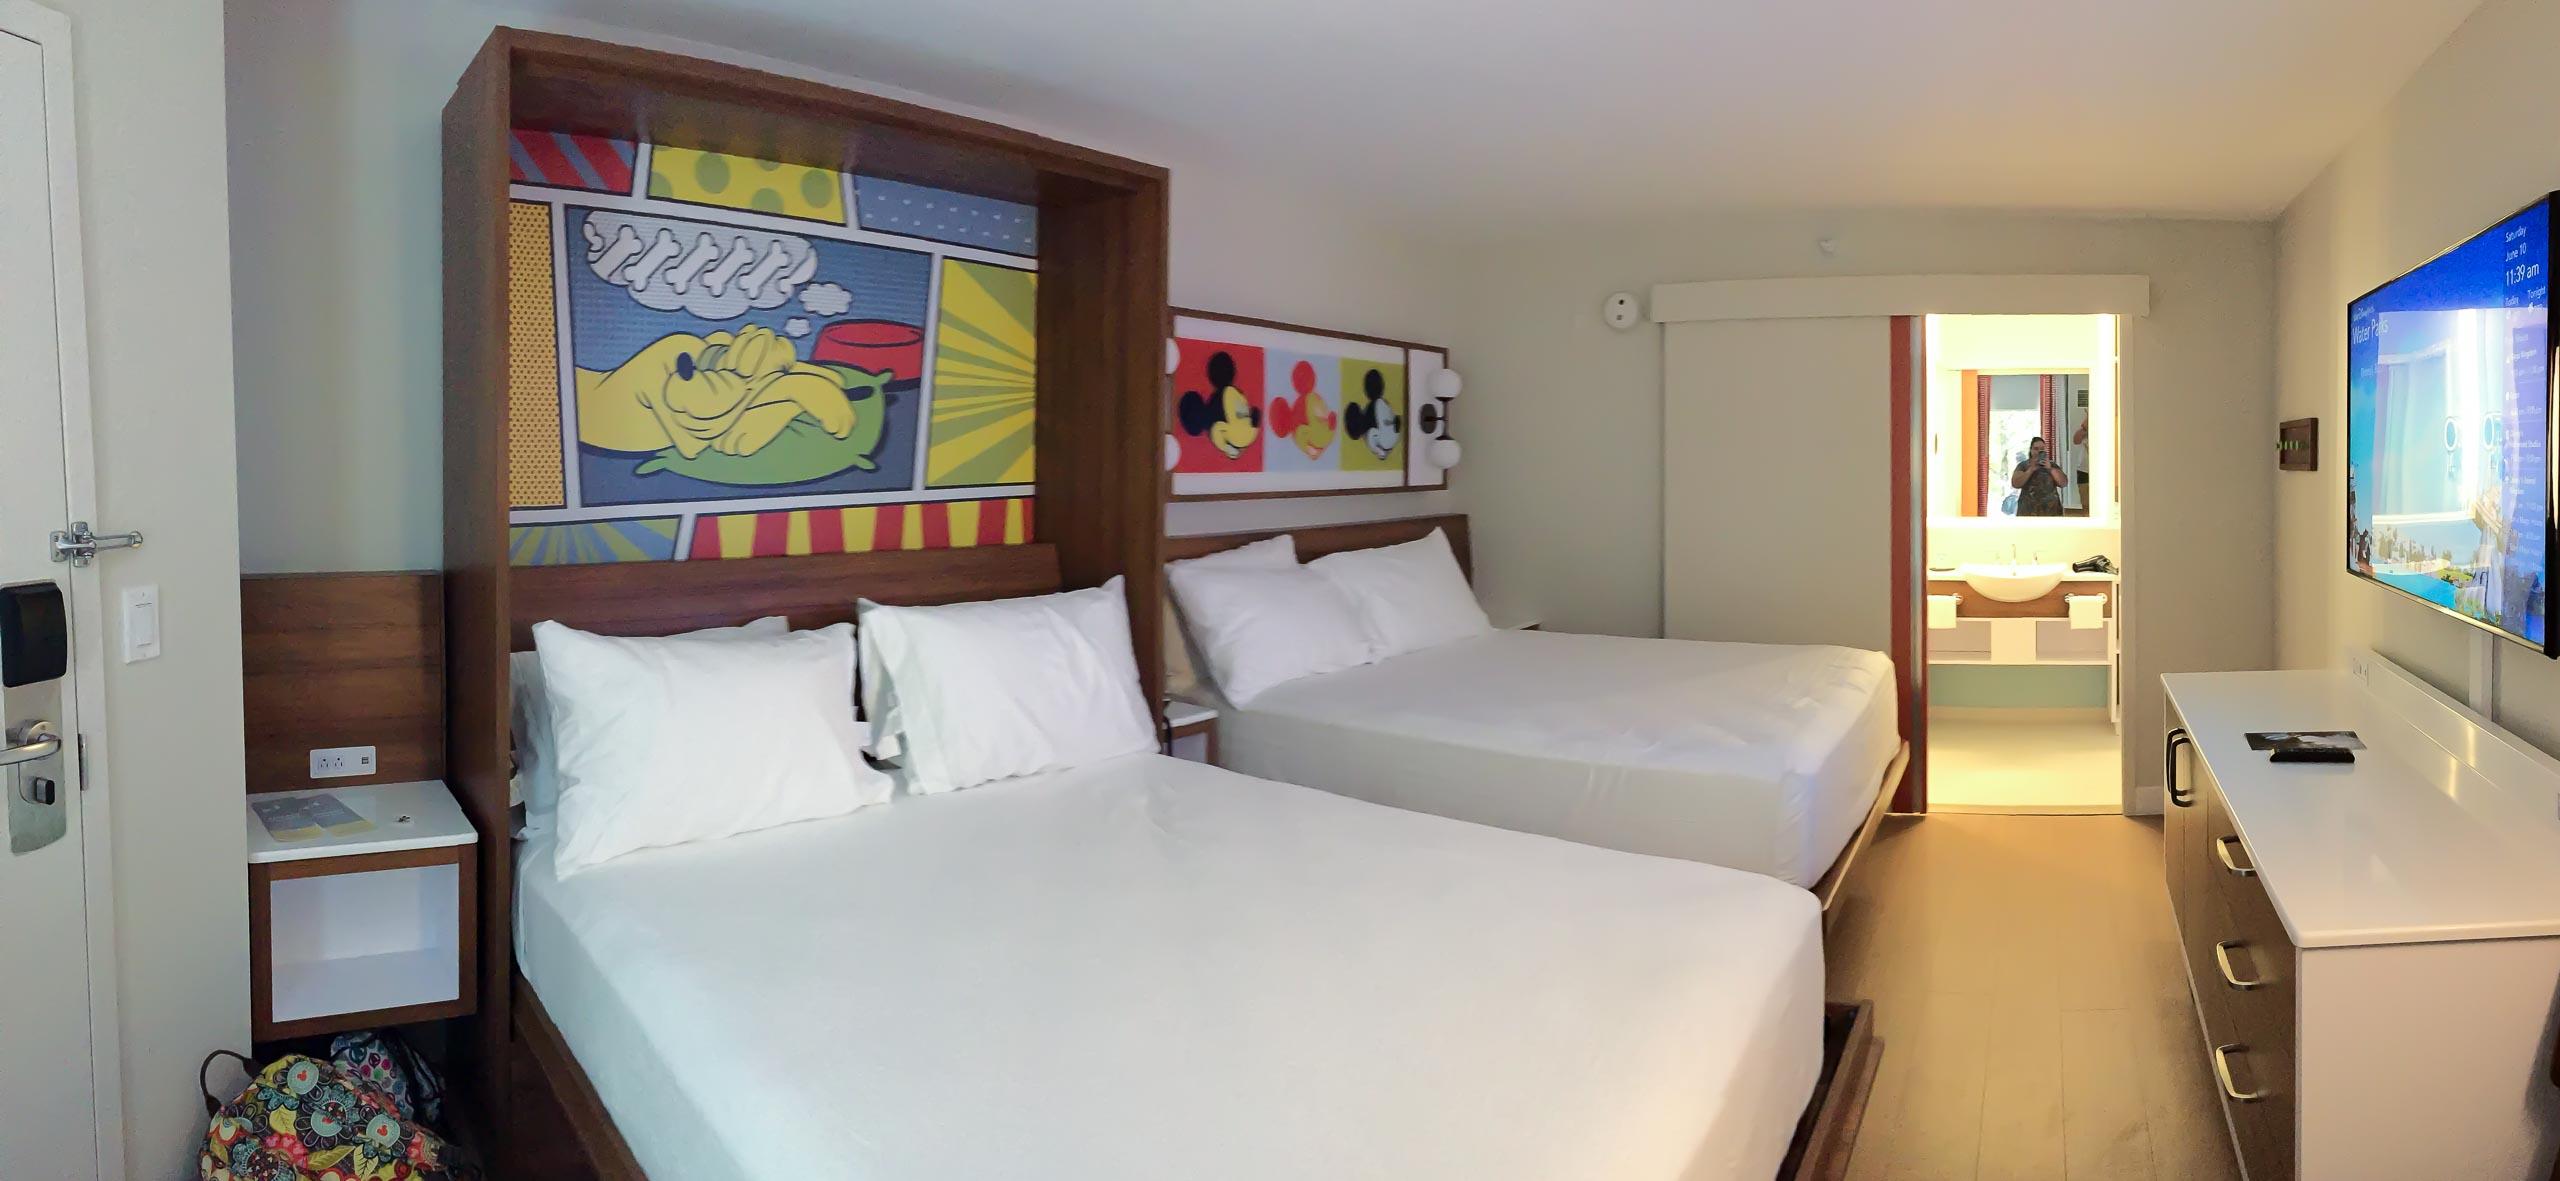 2017 pop century resort room refurbishment photo 2 of 3 2017 pop century resort room refurbishment publicscrutiny Images